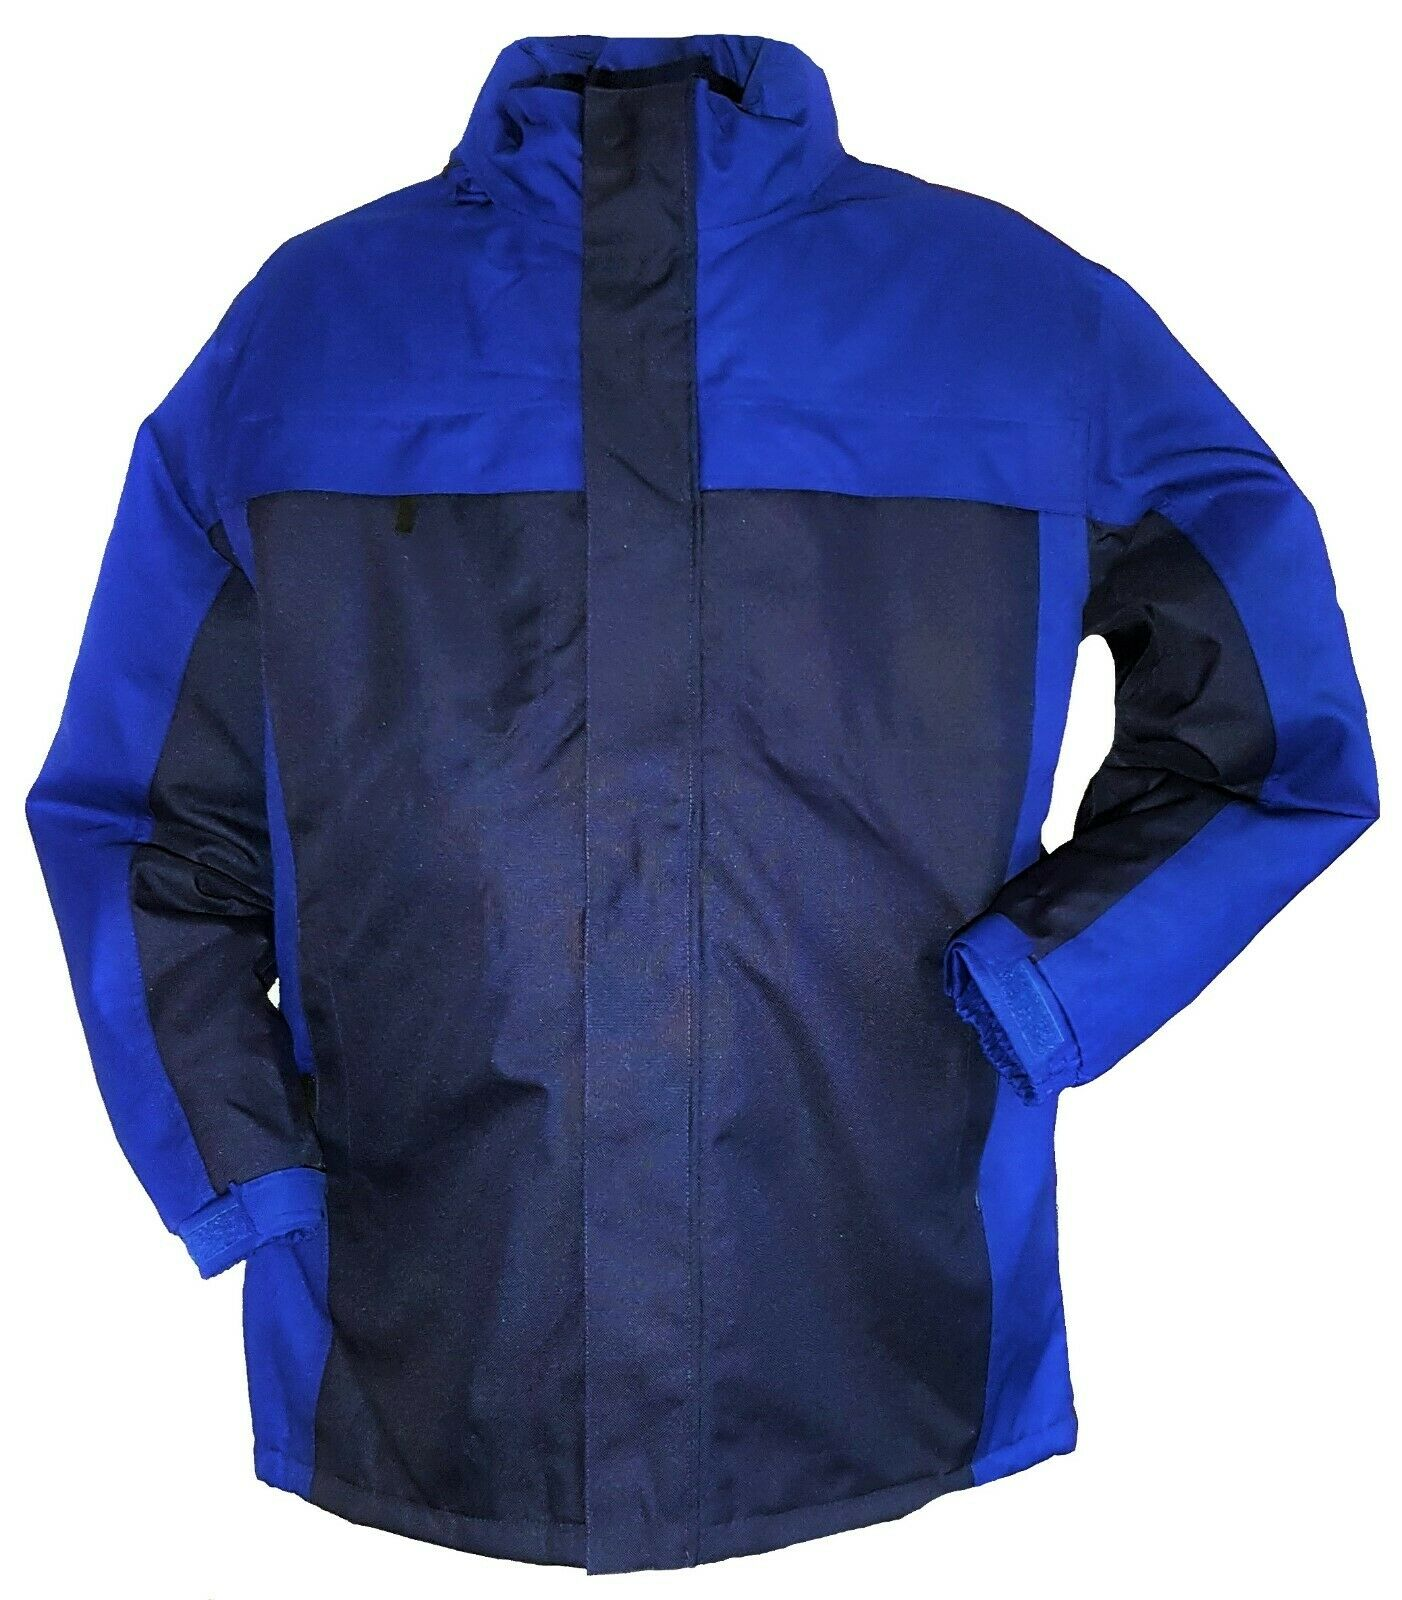 Arbeitsparka Format Wetter-Dress Parka Arbeitsjacken Jacke Kornblau/Marine L-XXL